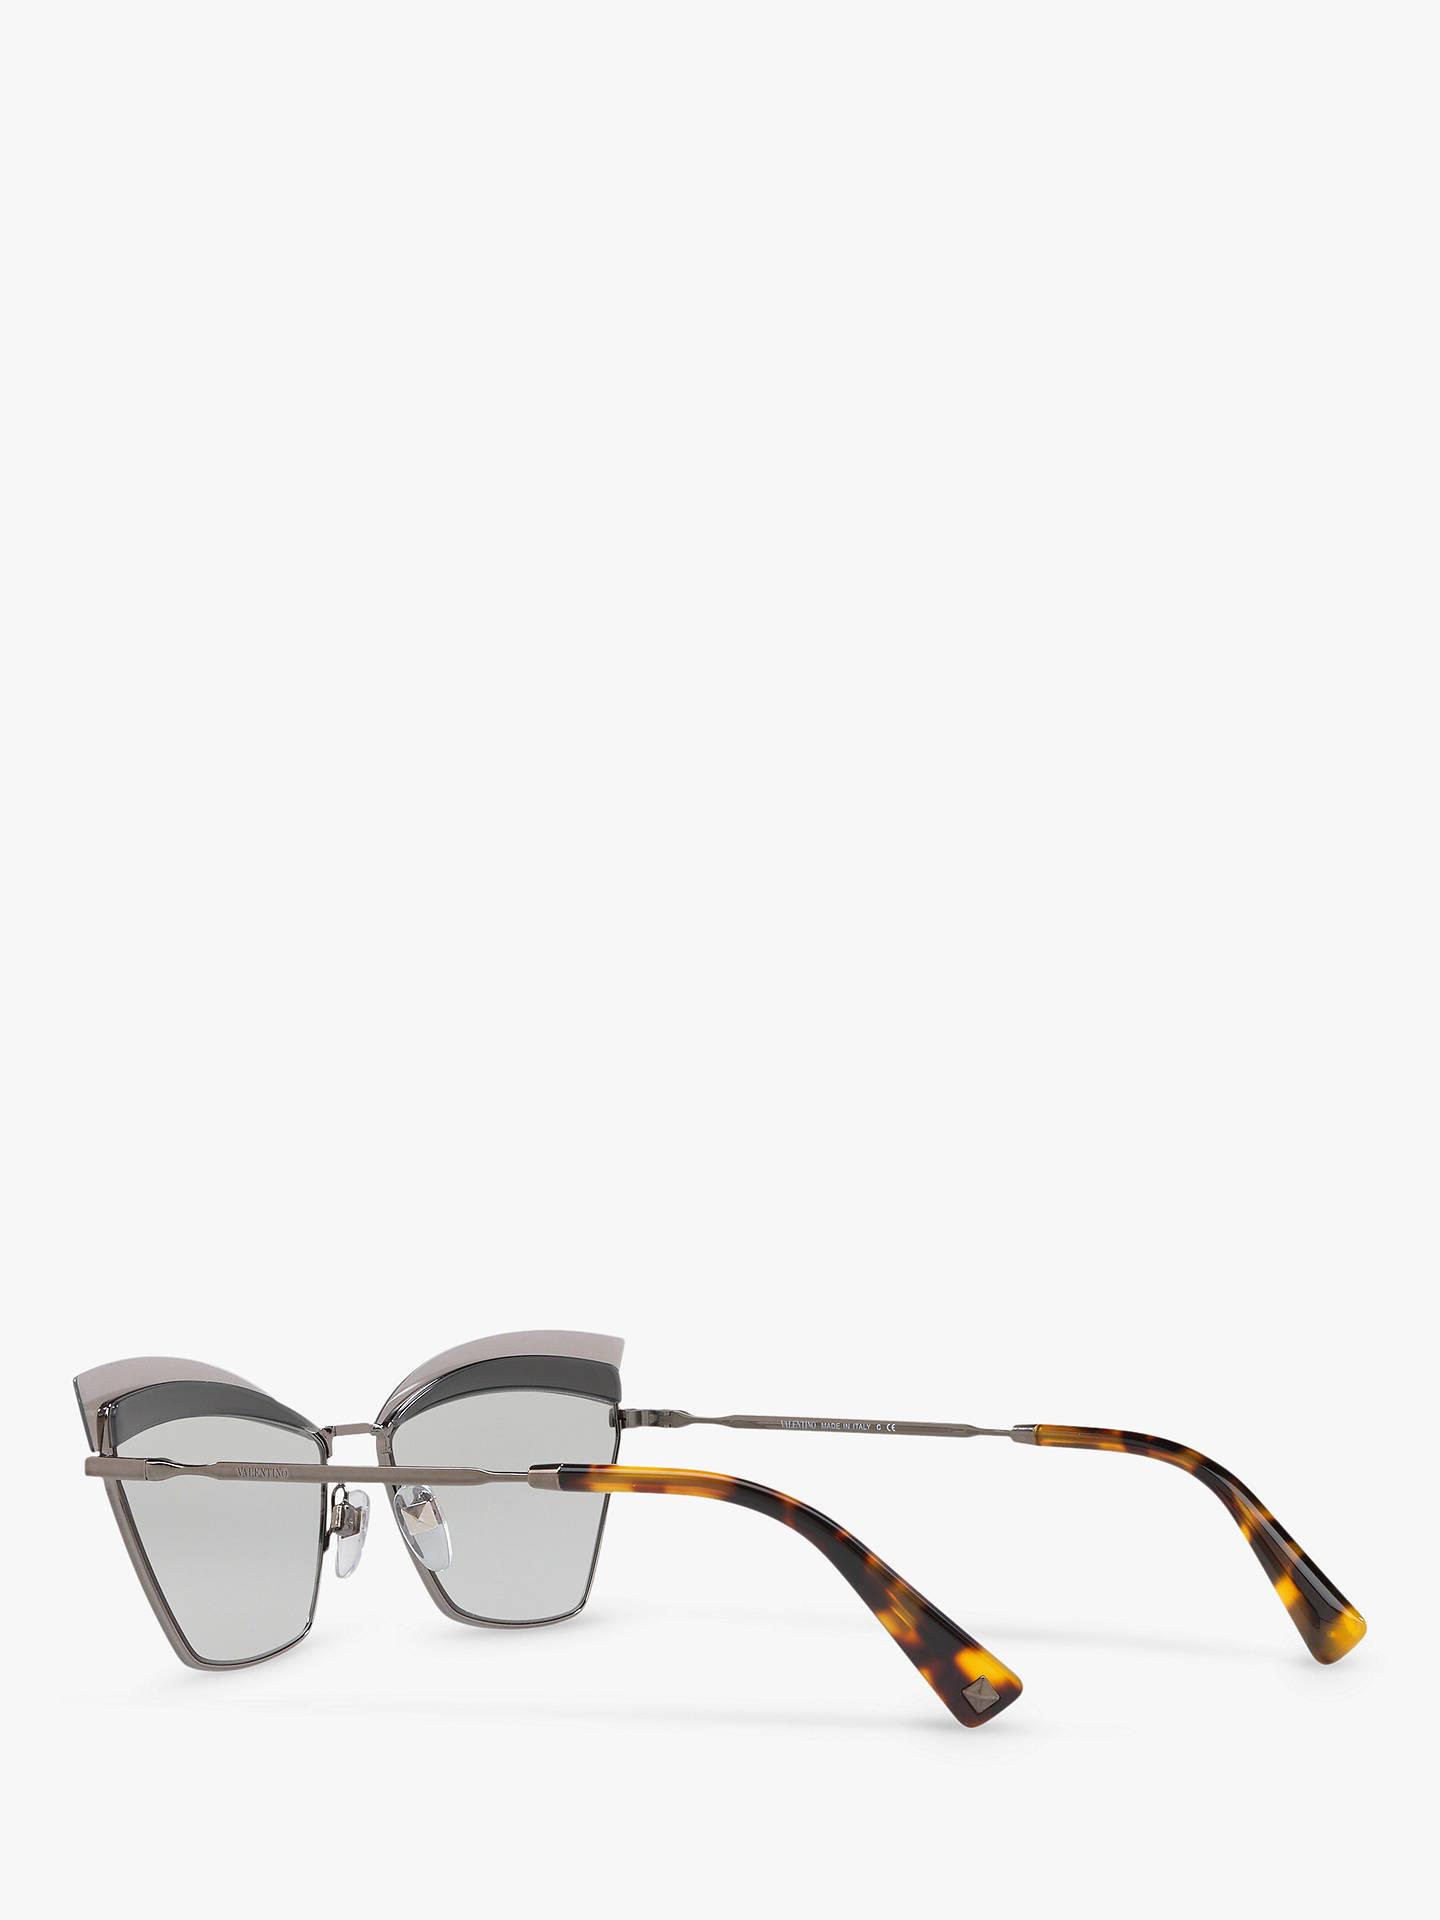 7a08d2fc2f Valentino VA2029 Cat's Eye Sunglasses, Gunmetal/Silver